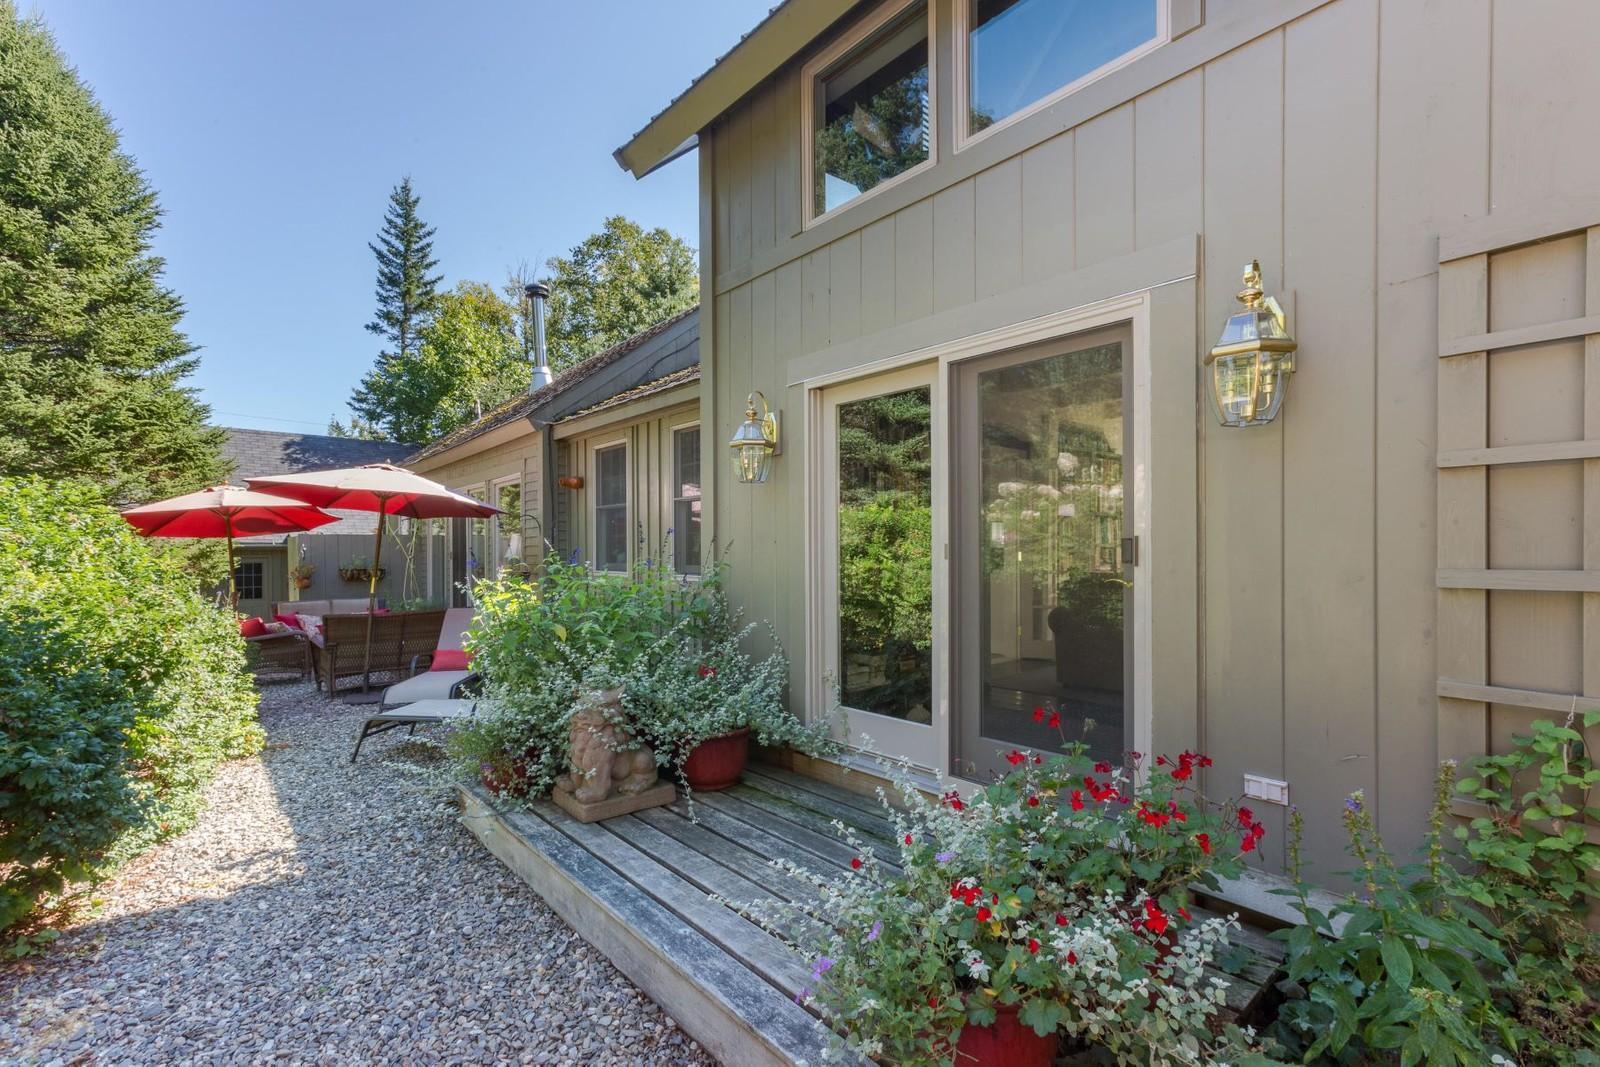 Single Family Homes for Sale at 147 Jenny's Lane Islesboro, Maine 04848 United States